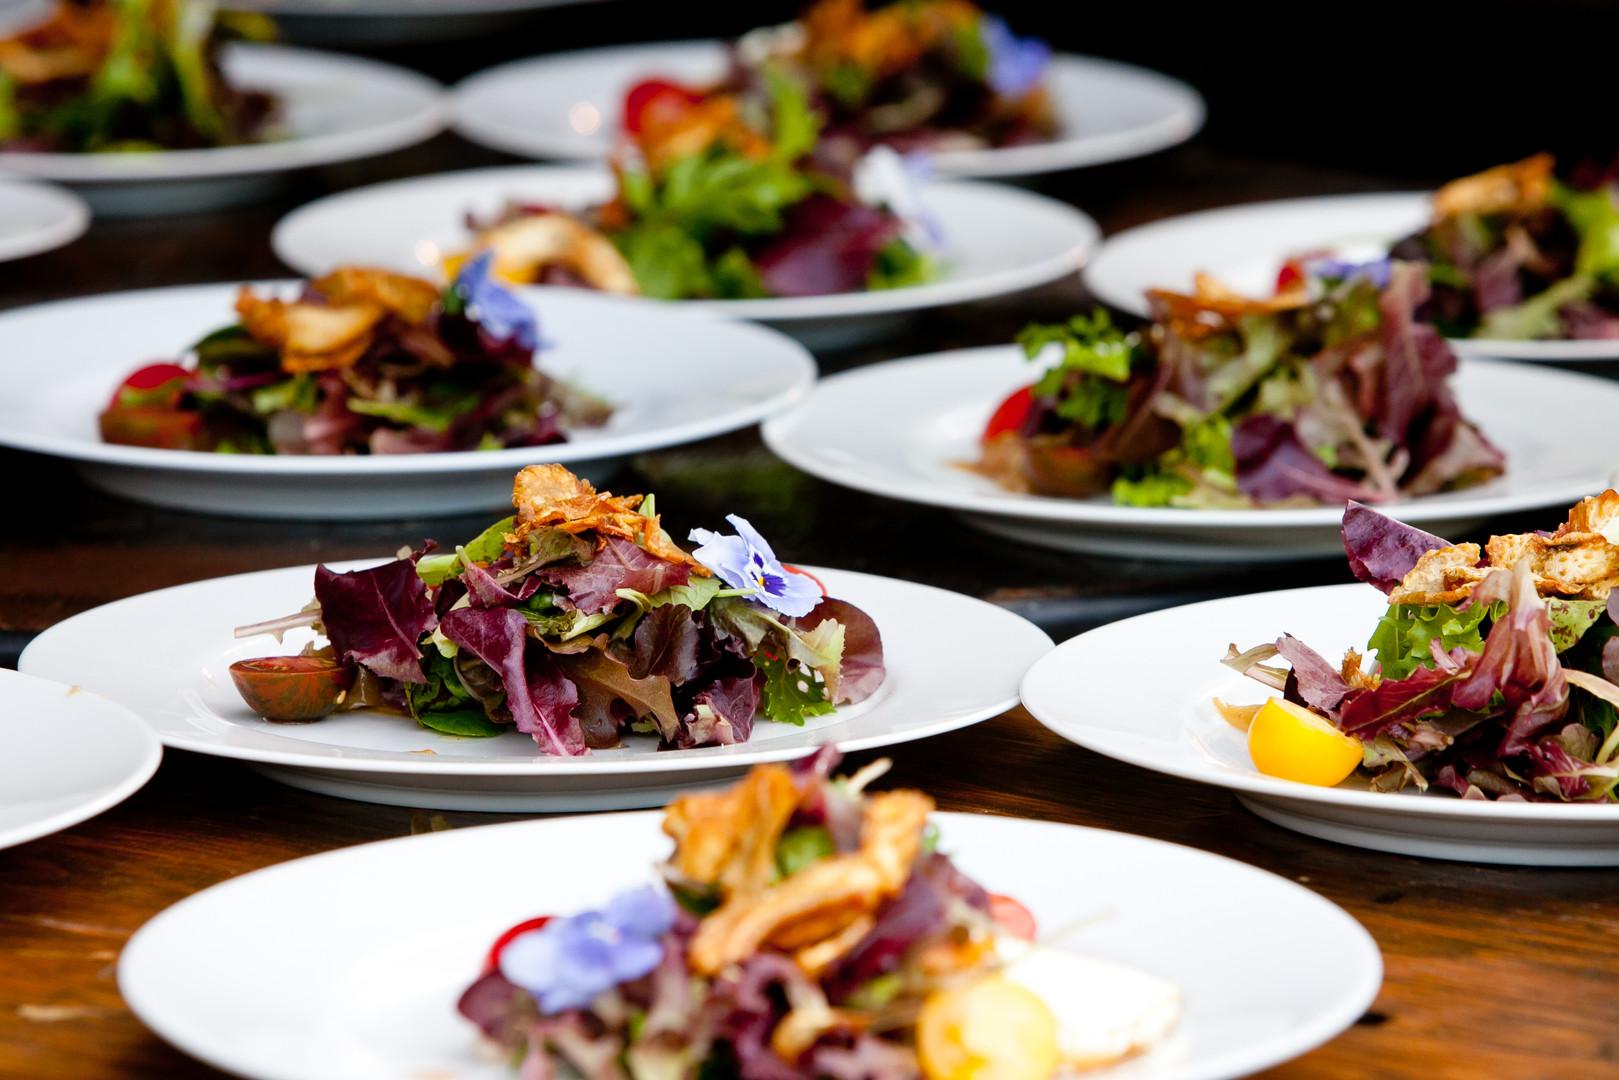 Salads on white plates